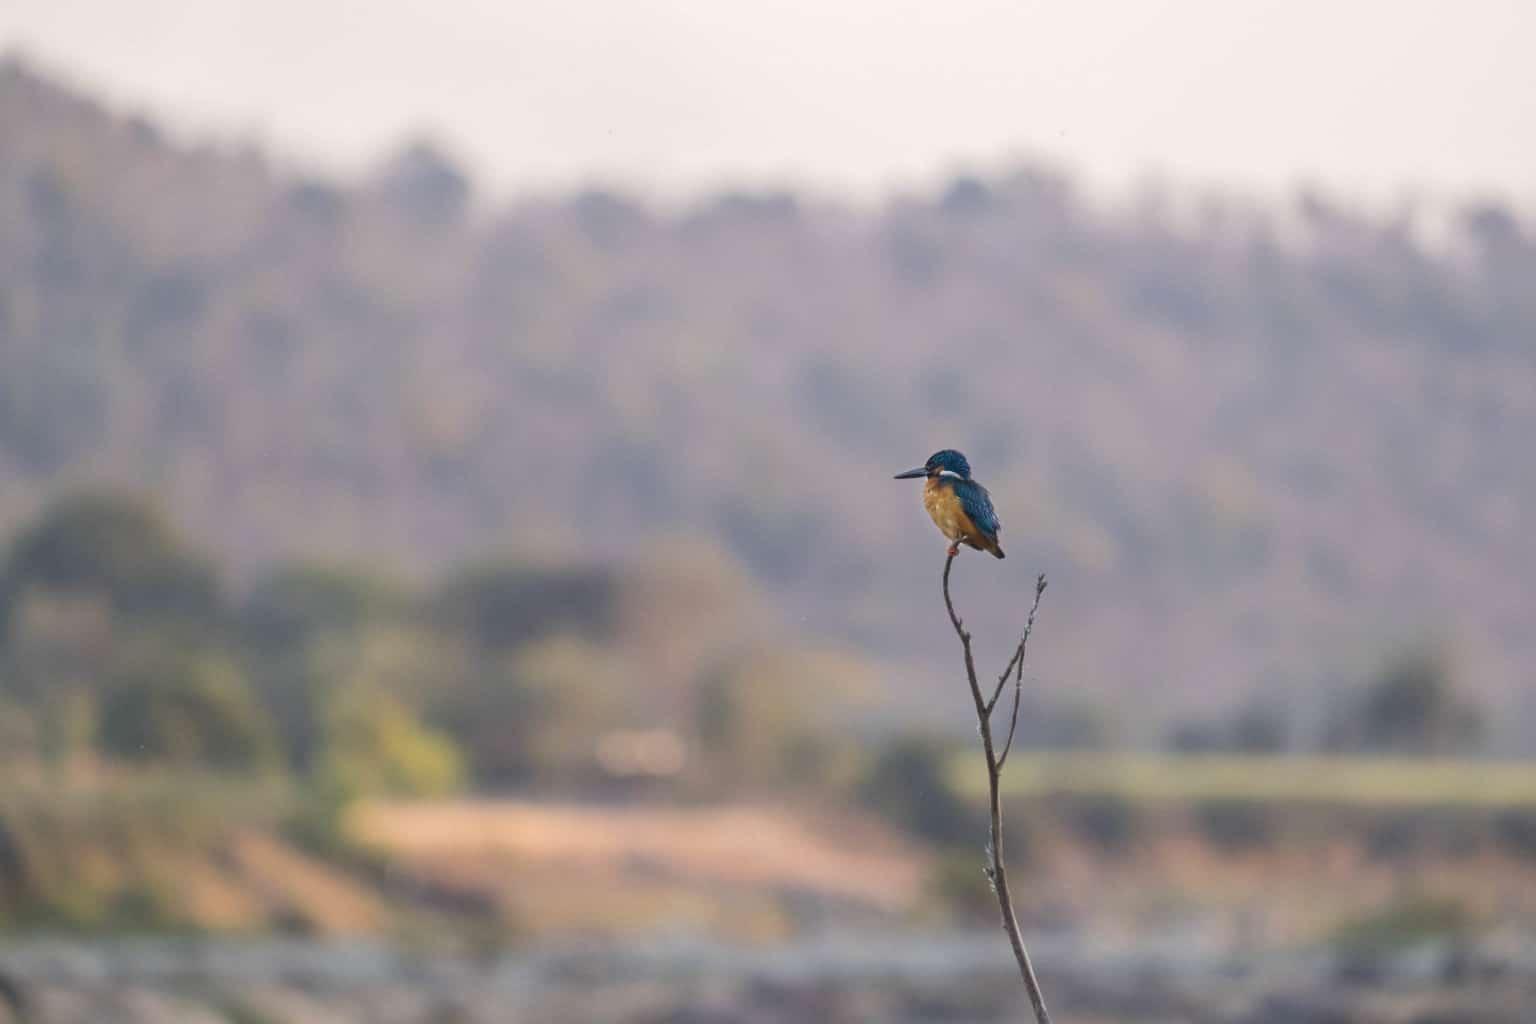 Kingfisher Ken River, Panna